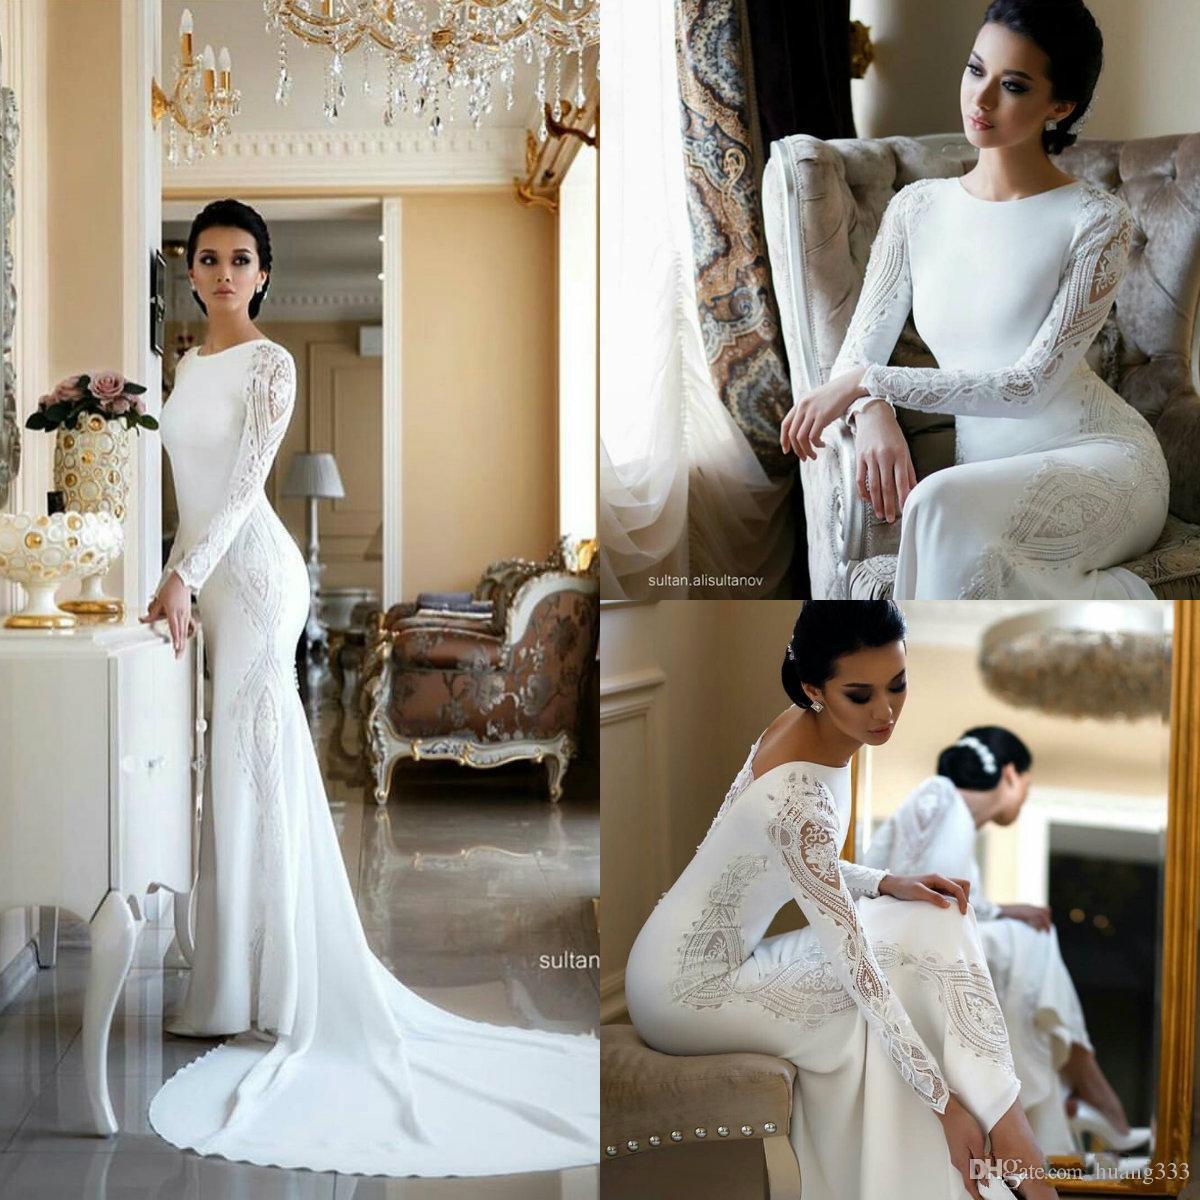 New Modest Mermaid Wedding Dresses Lace Appliqued Beaded Berta Sweep Train Boho Wedding Dress Bridal Gowns Plus Size Sleeves abiti da sposa